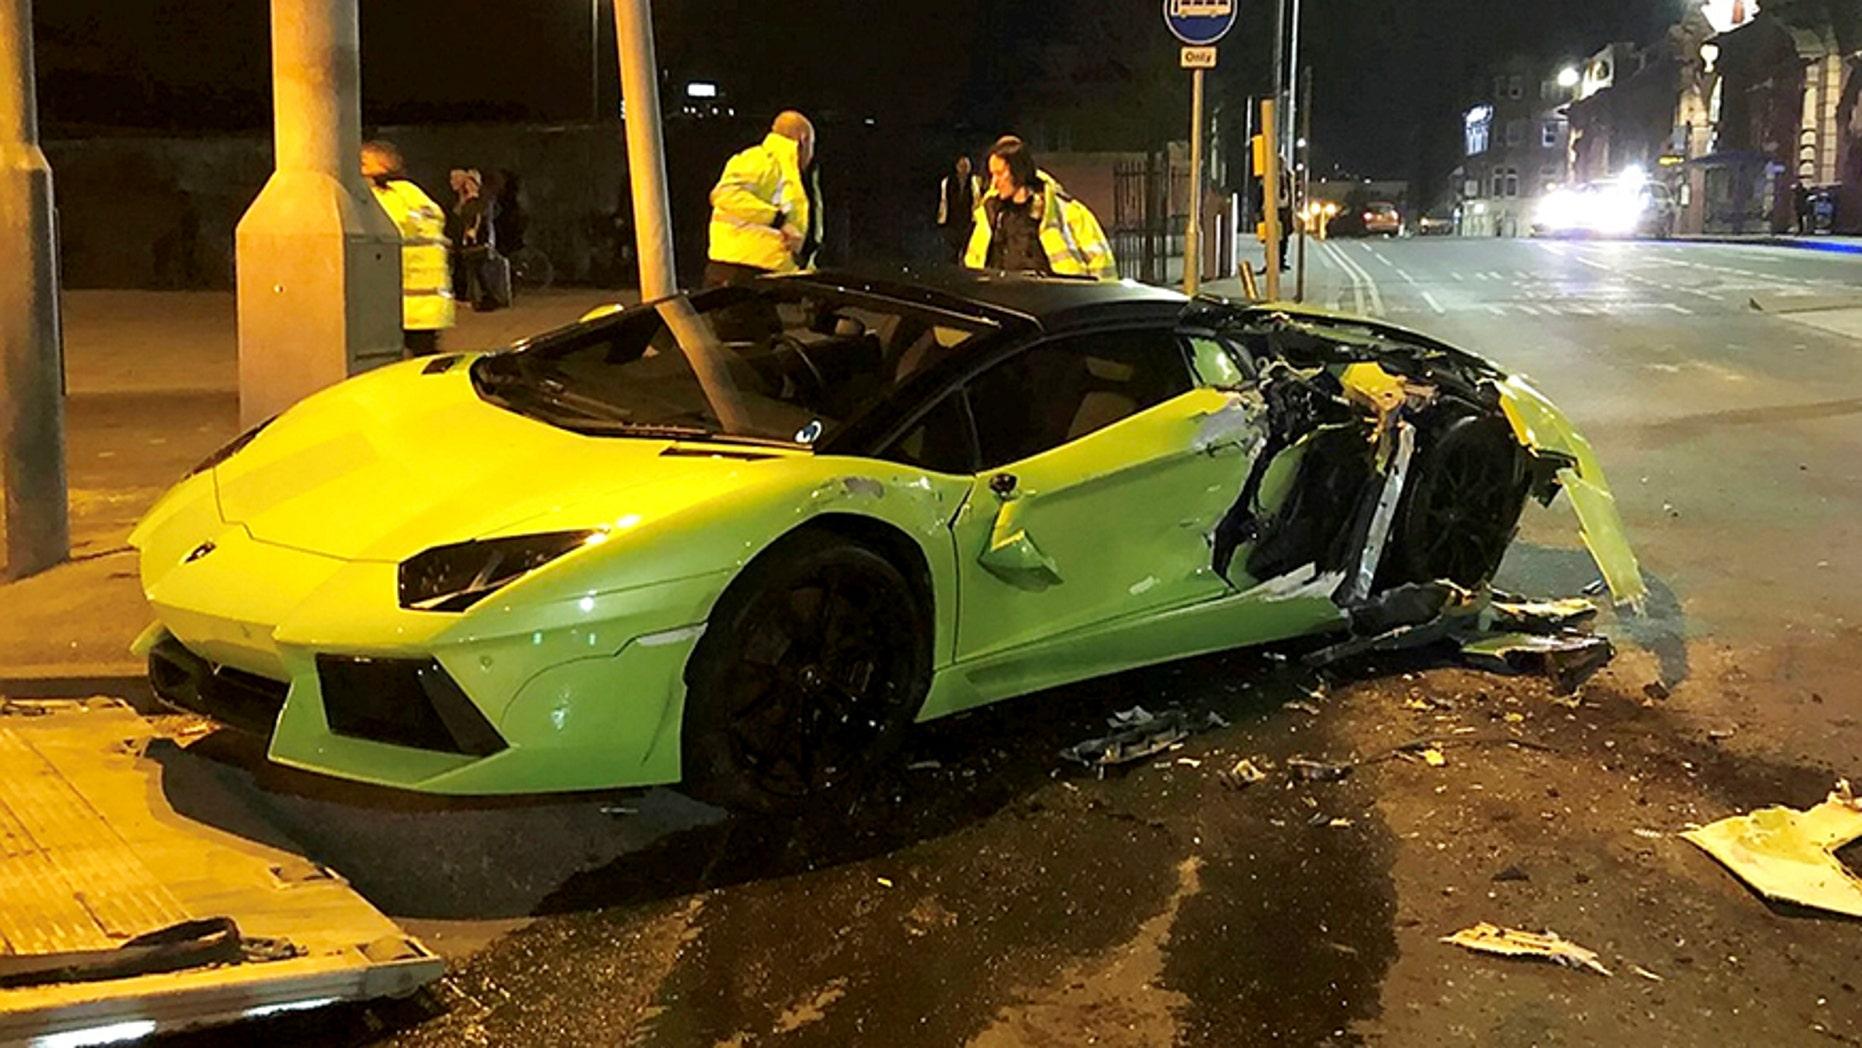 The Wreckage Of A Green Lamborghini Following Crash With Bus In Carrington Street